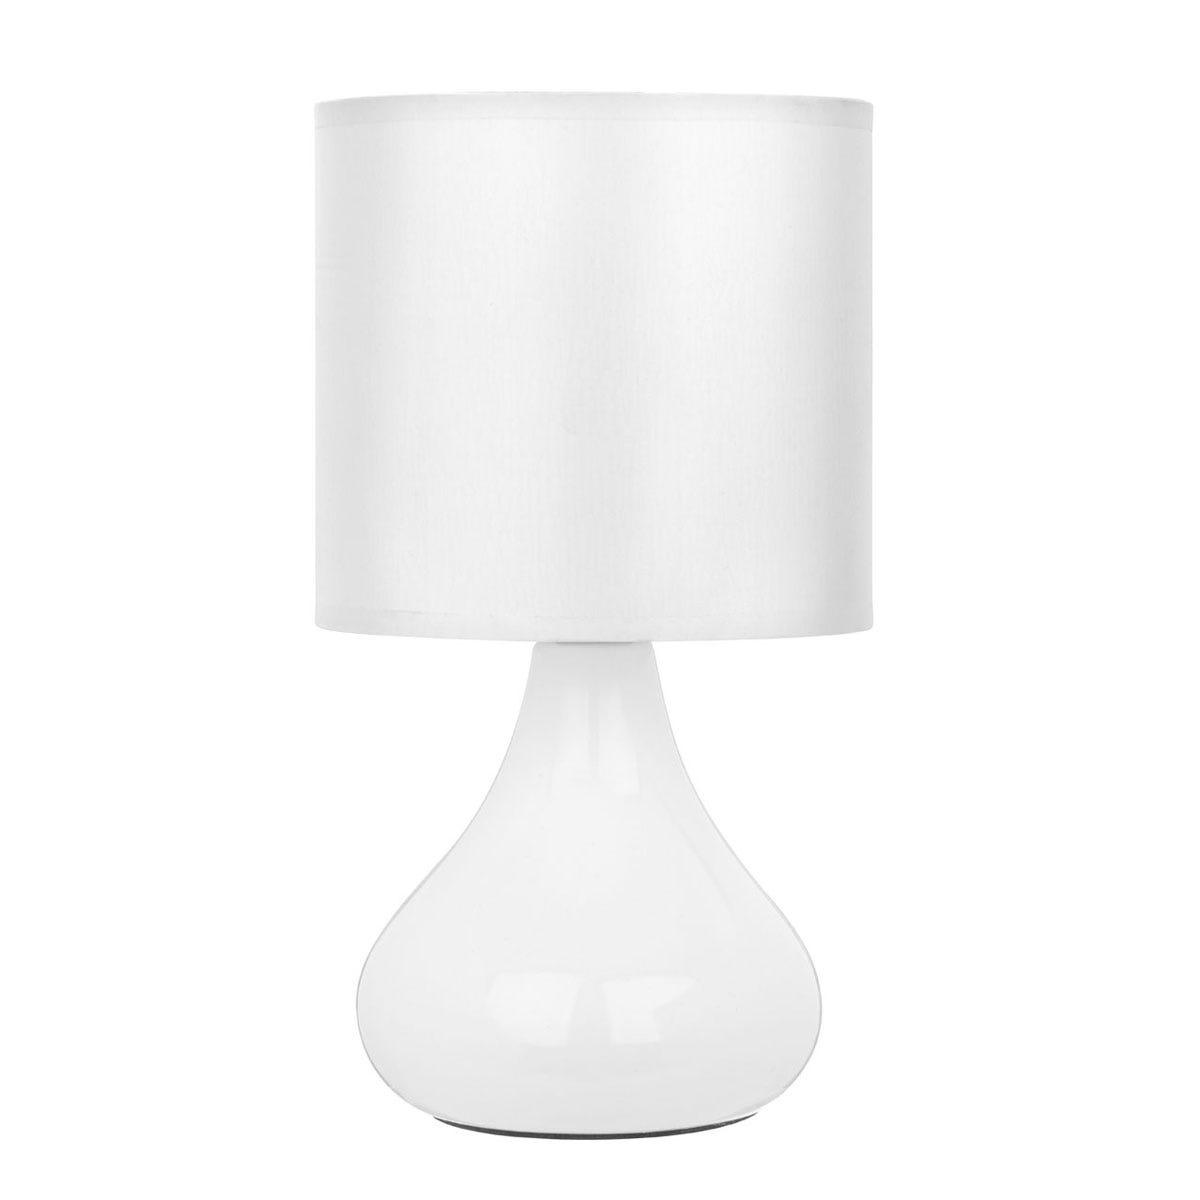 Premier Housewares Bulbus Ceramic Minimalist Table Lamp - White